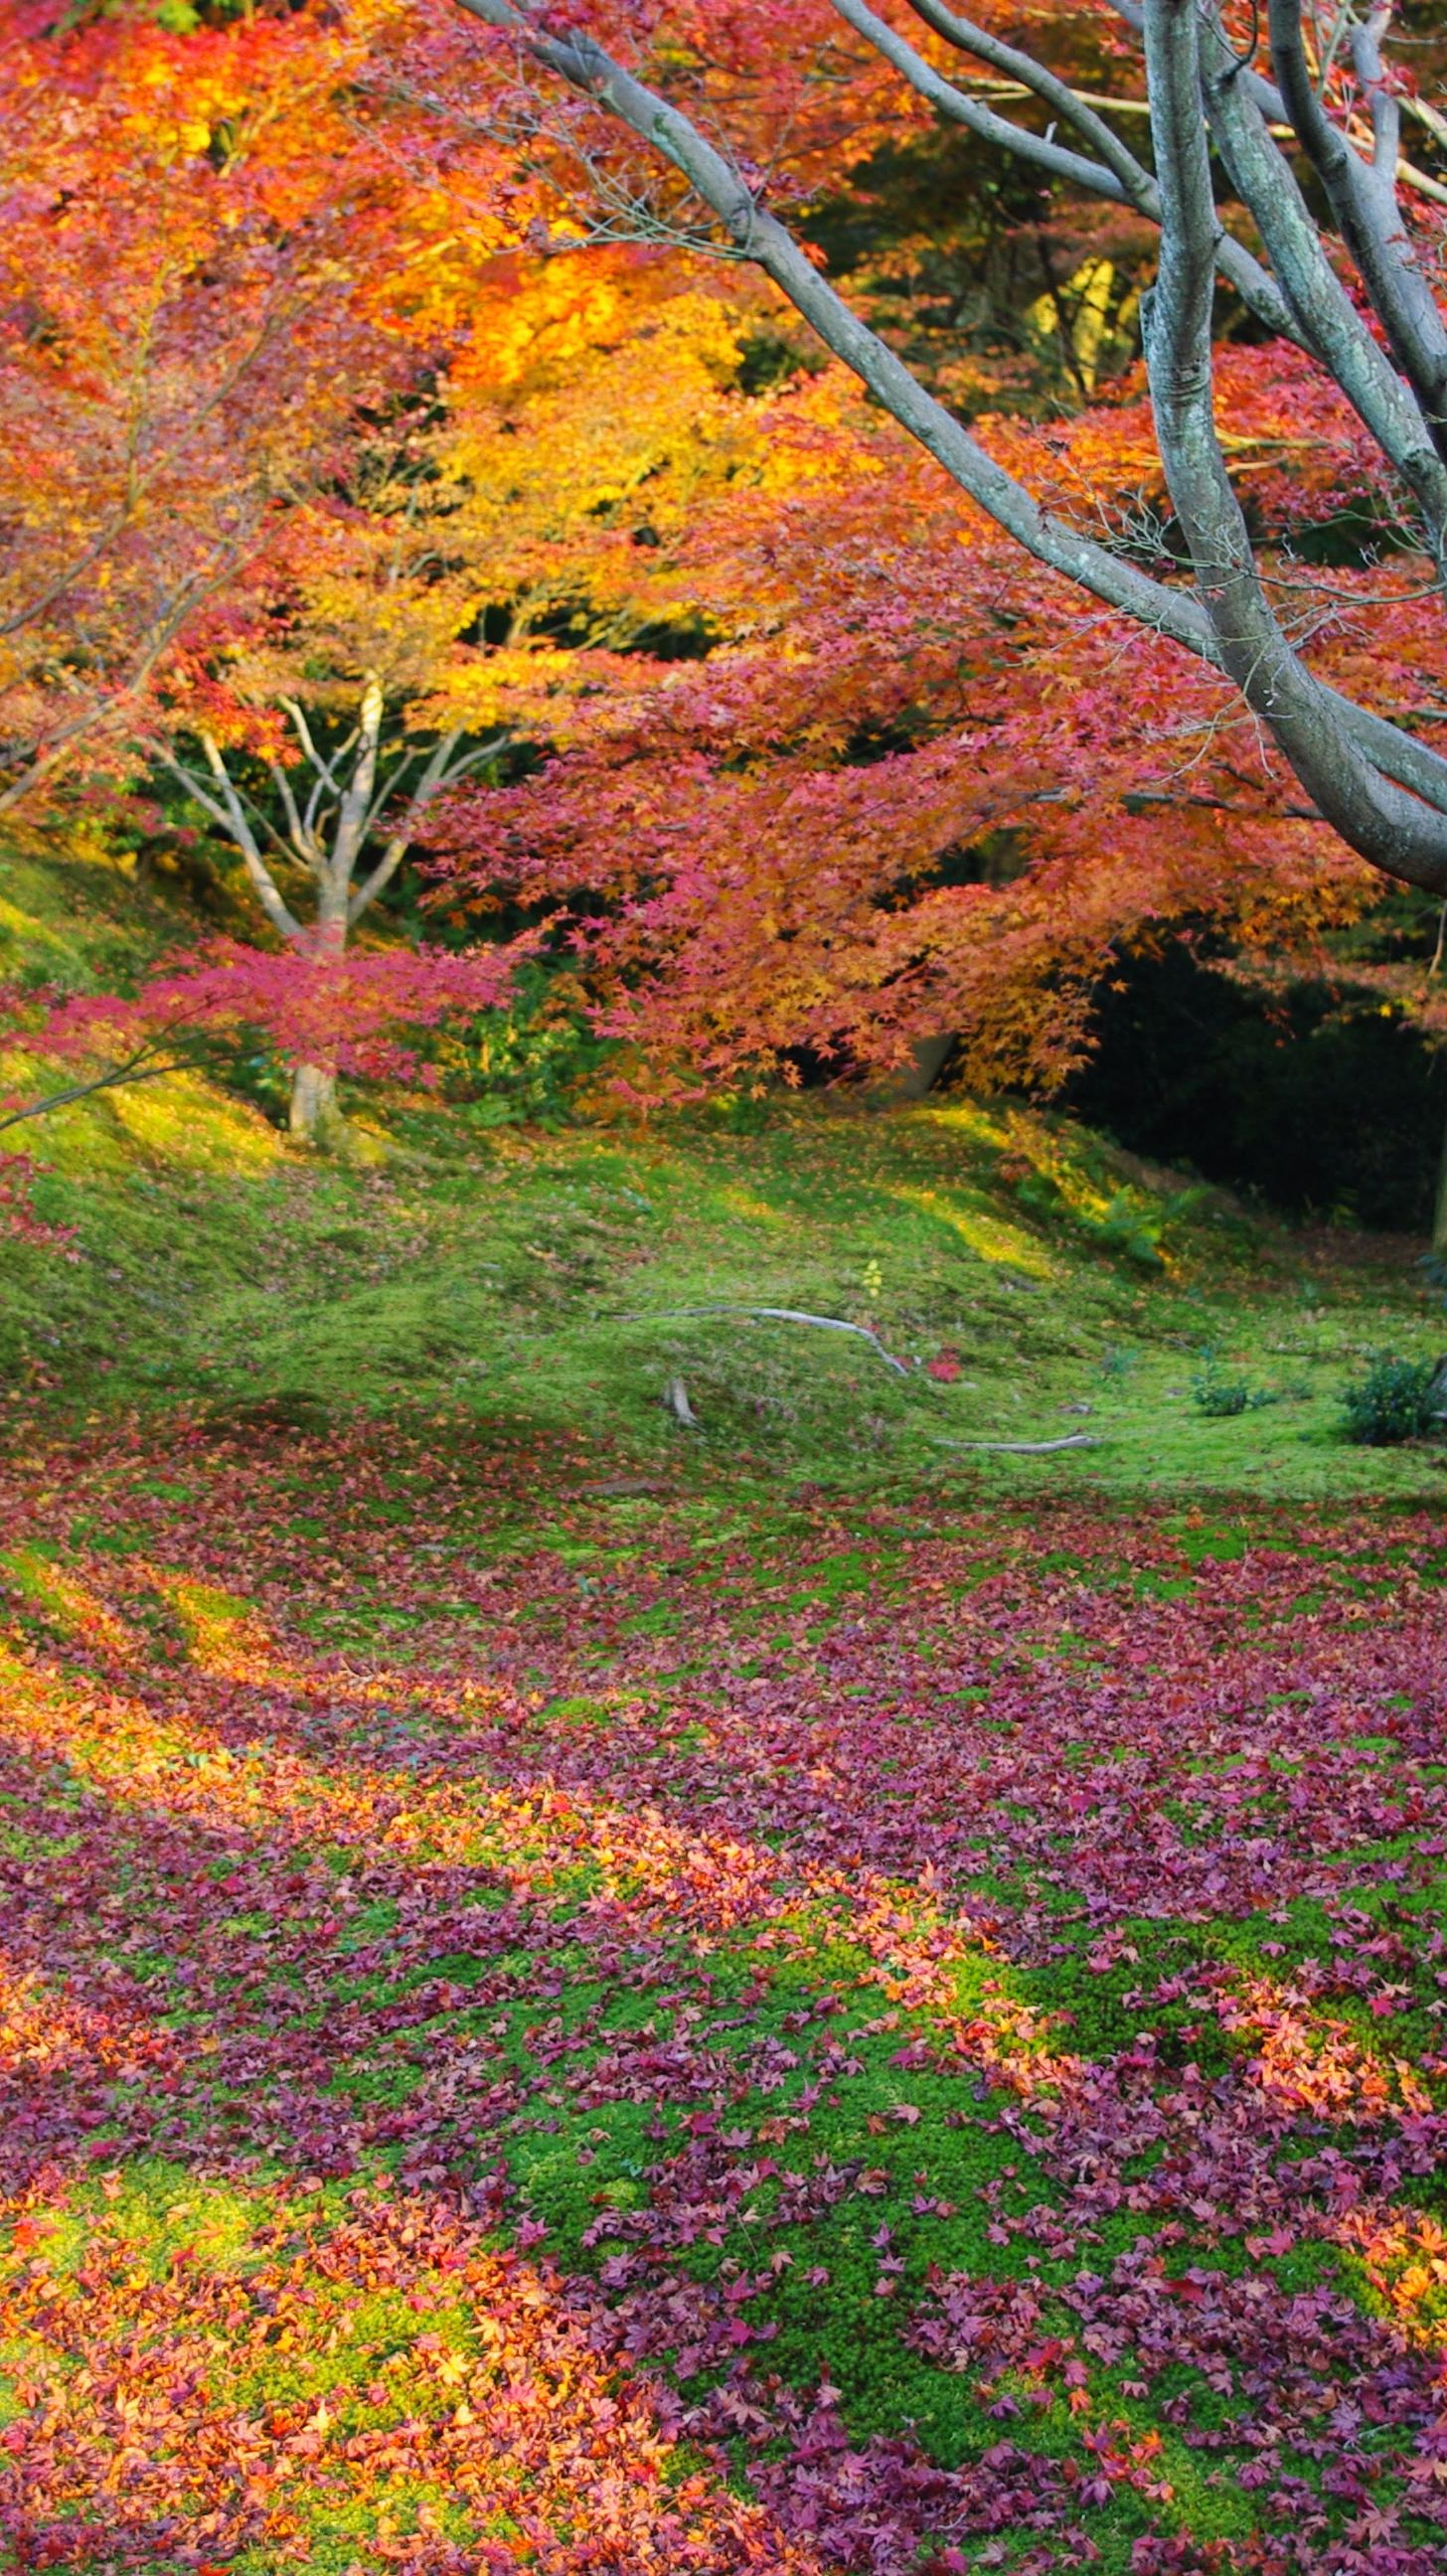 Colorful Leaves Tree Wallpaper iPhone Wallpaper iphoneswallpapers com